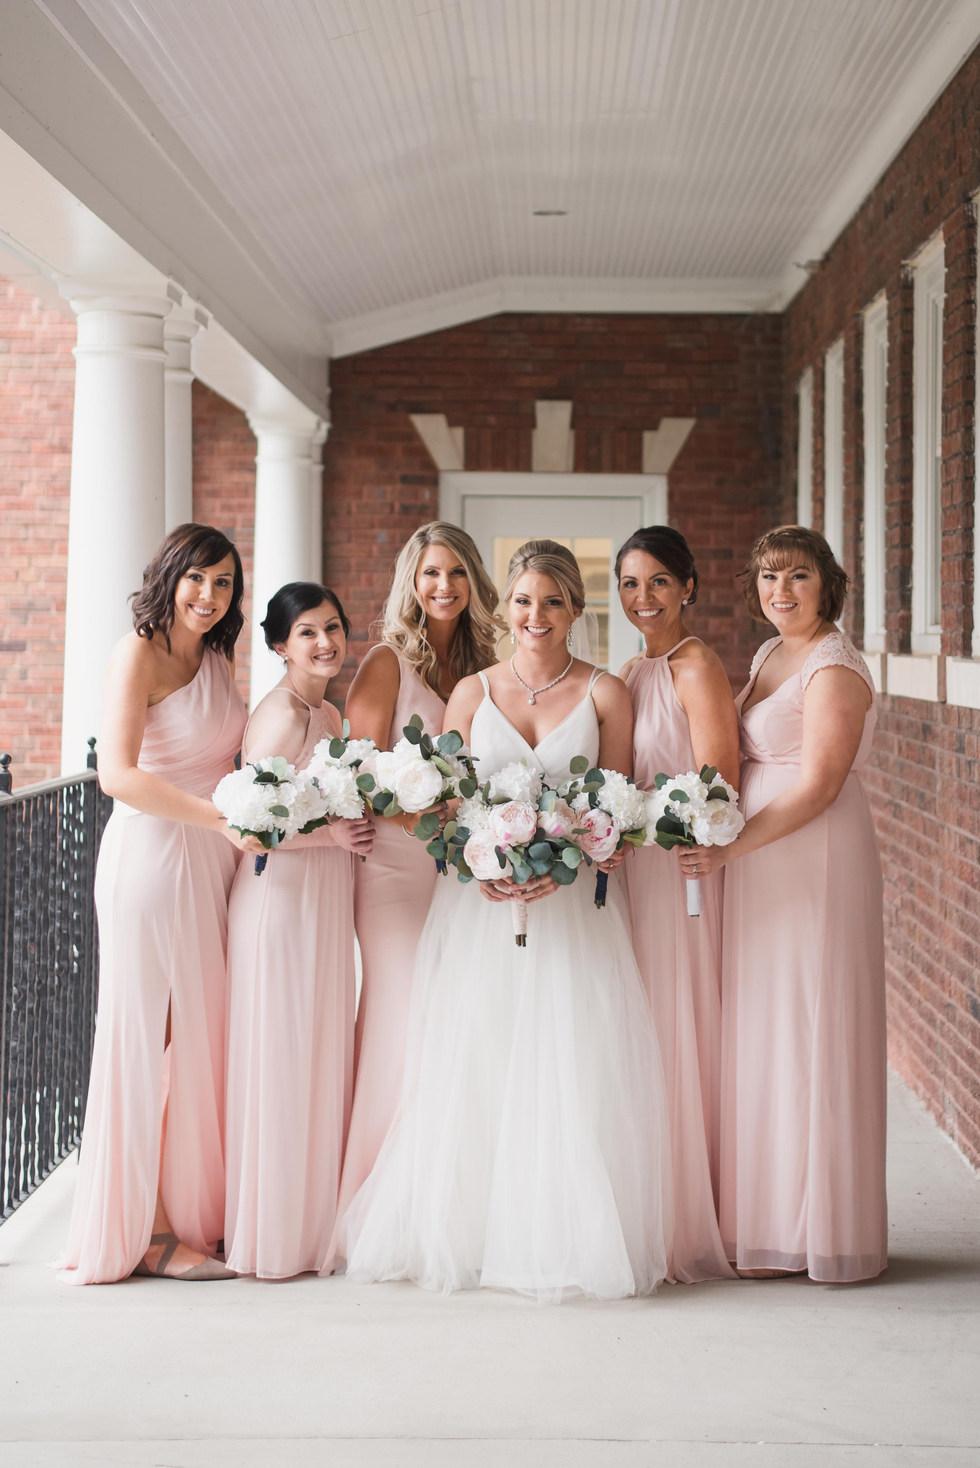 wedding portfolio add ons-7.JPG